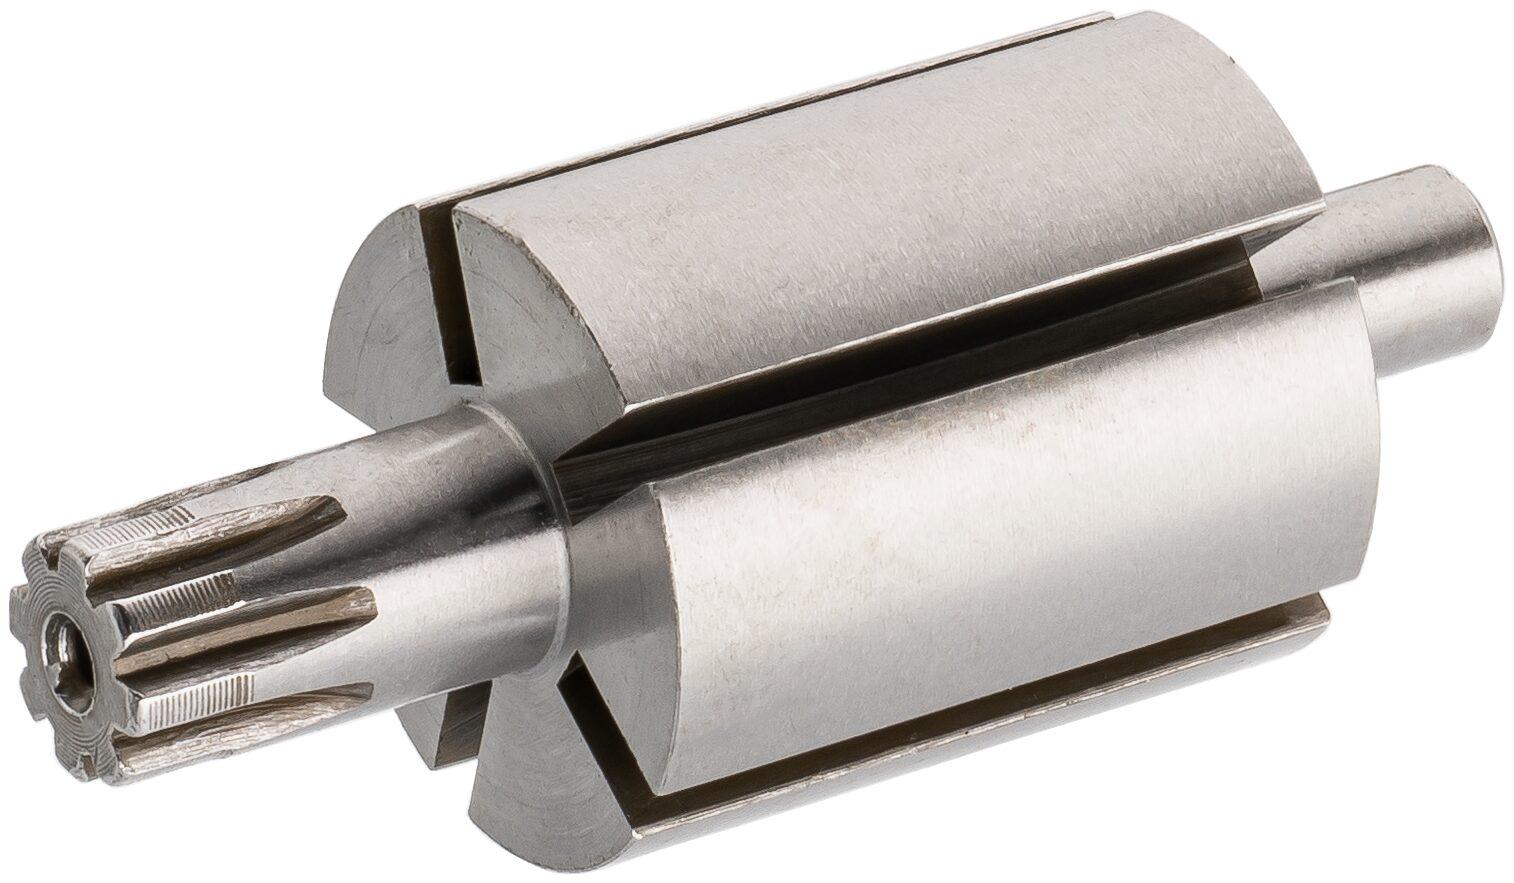 HAZET Rotor 9010-02